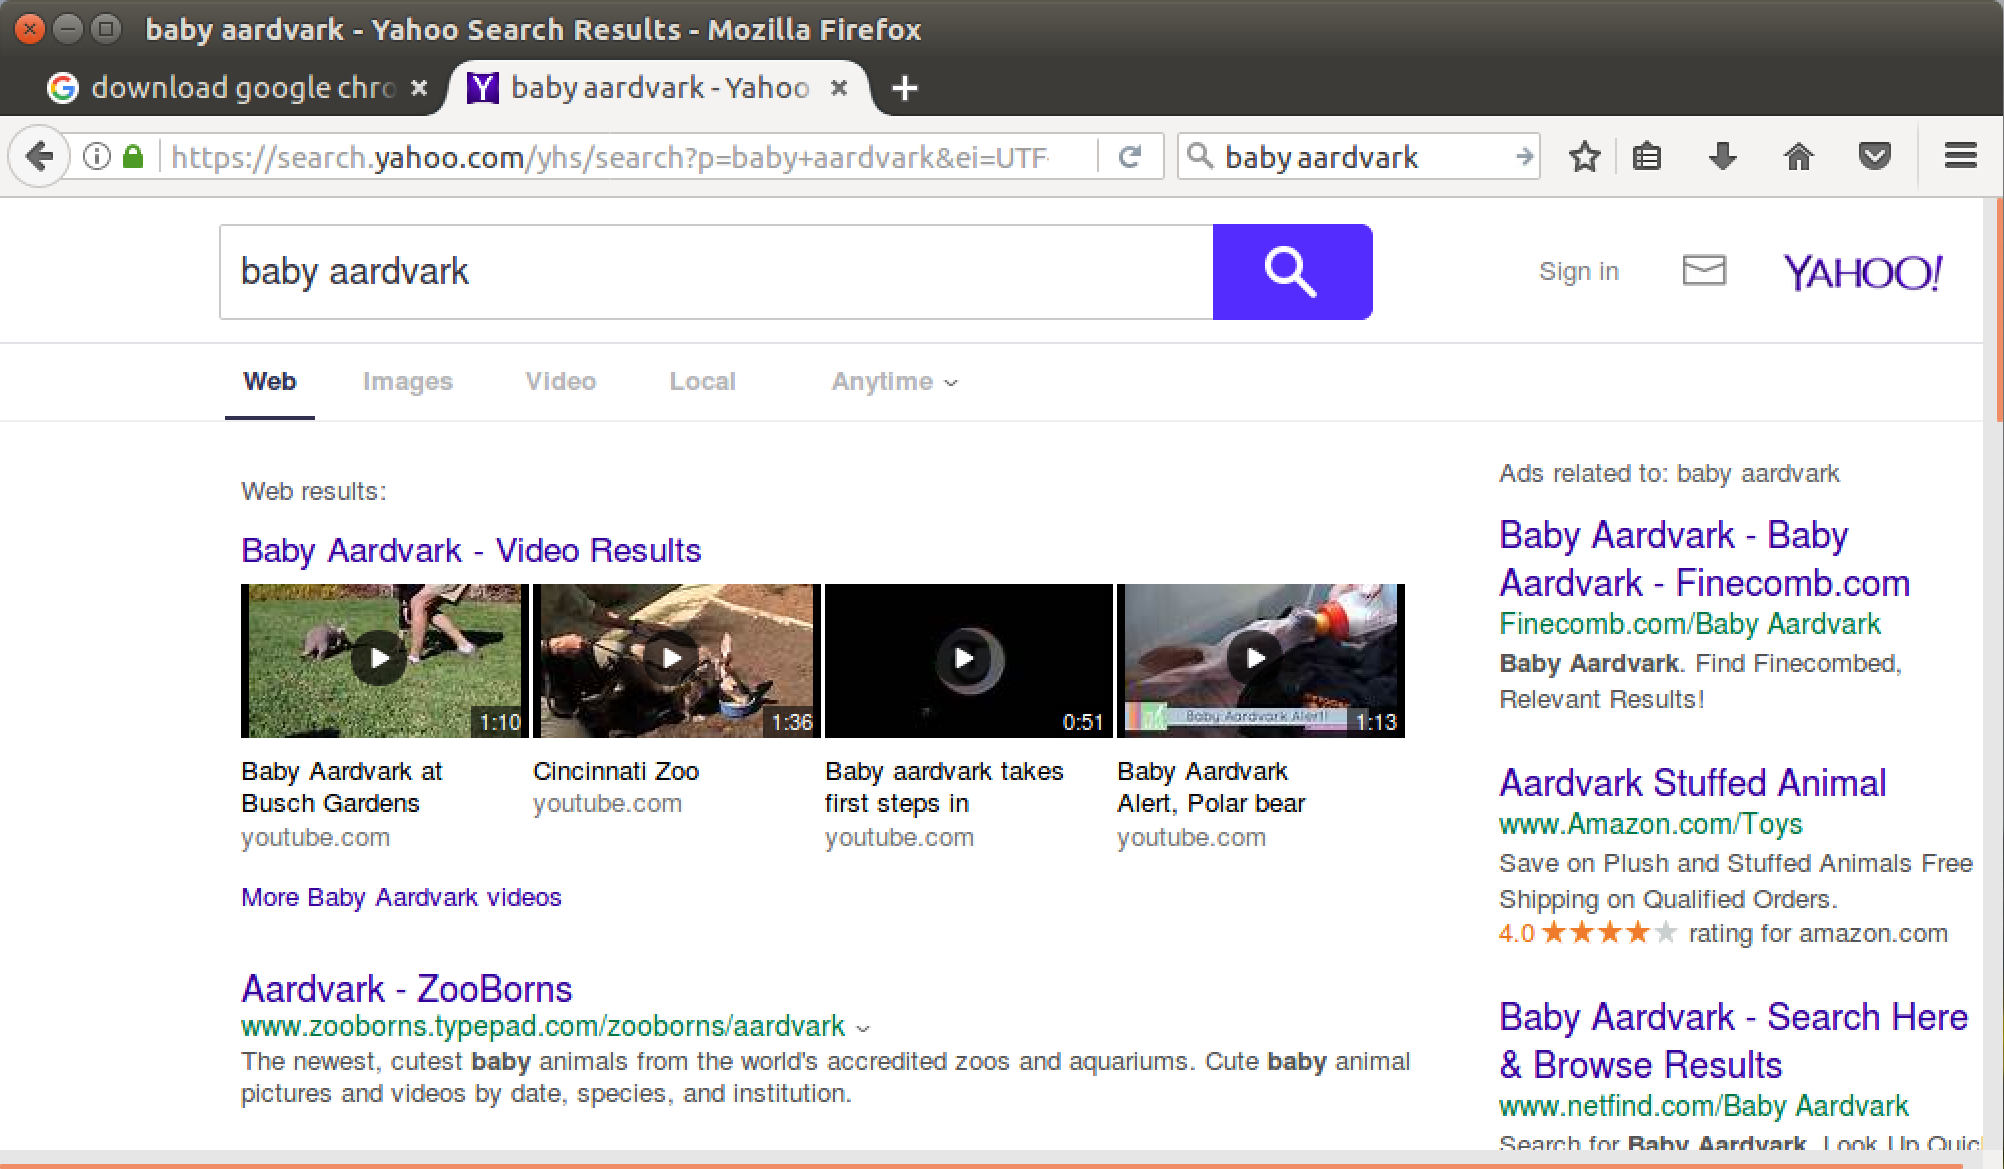 baby aardvark search, yahoo